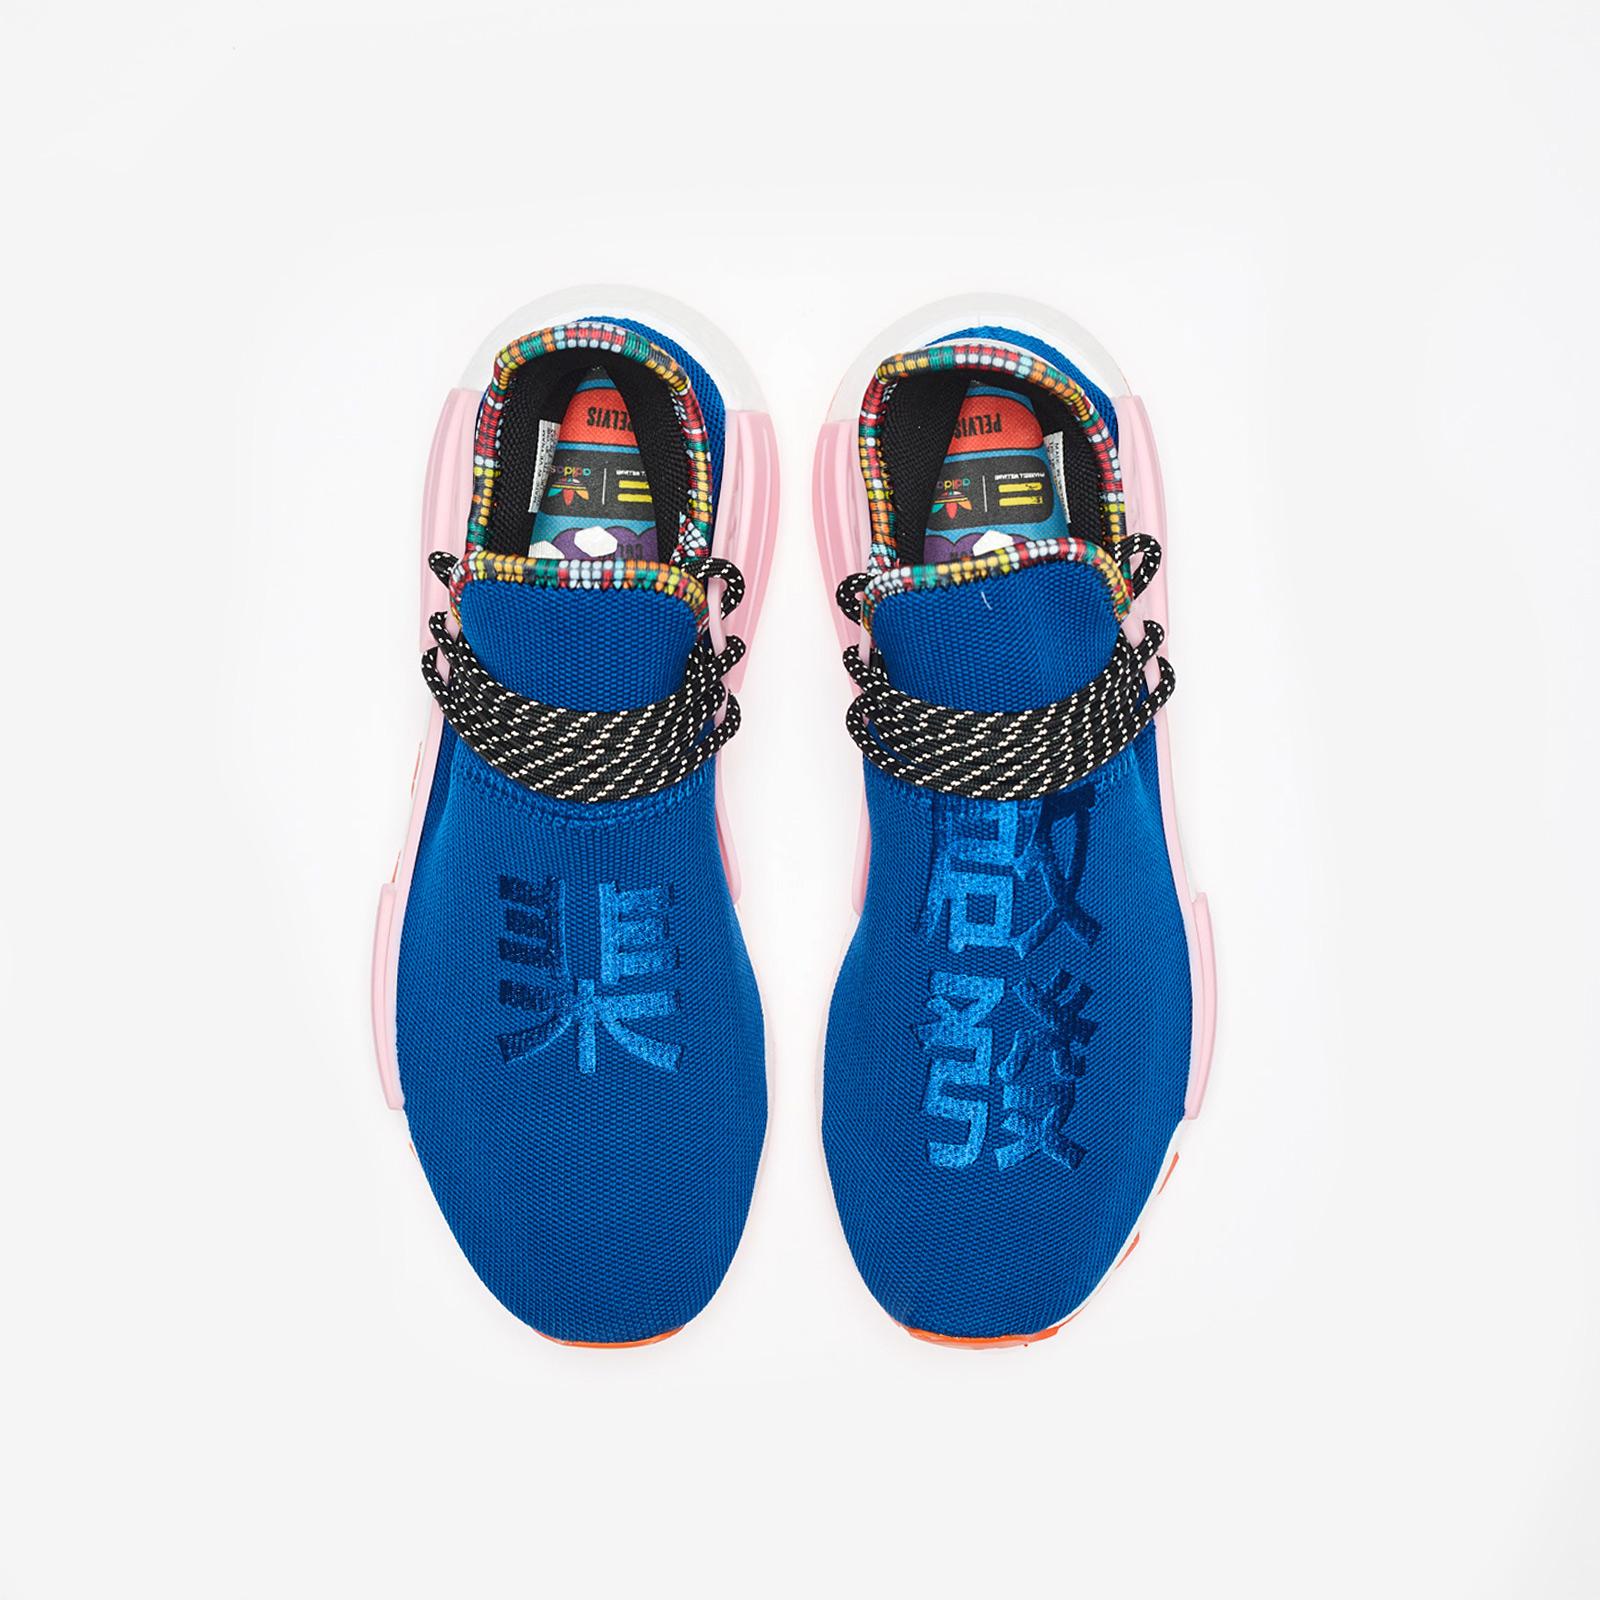 679d29b10 adidas by Pharrell Williams PW HU NMD - 7. Fermer